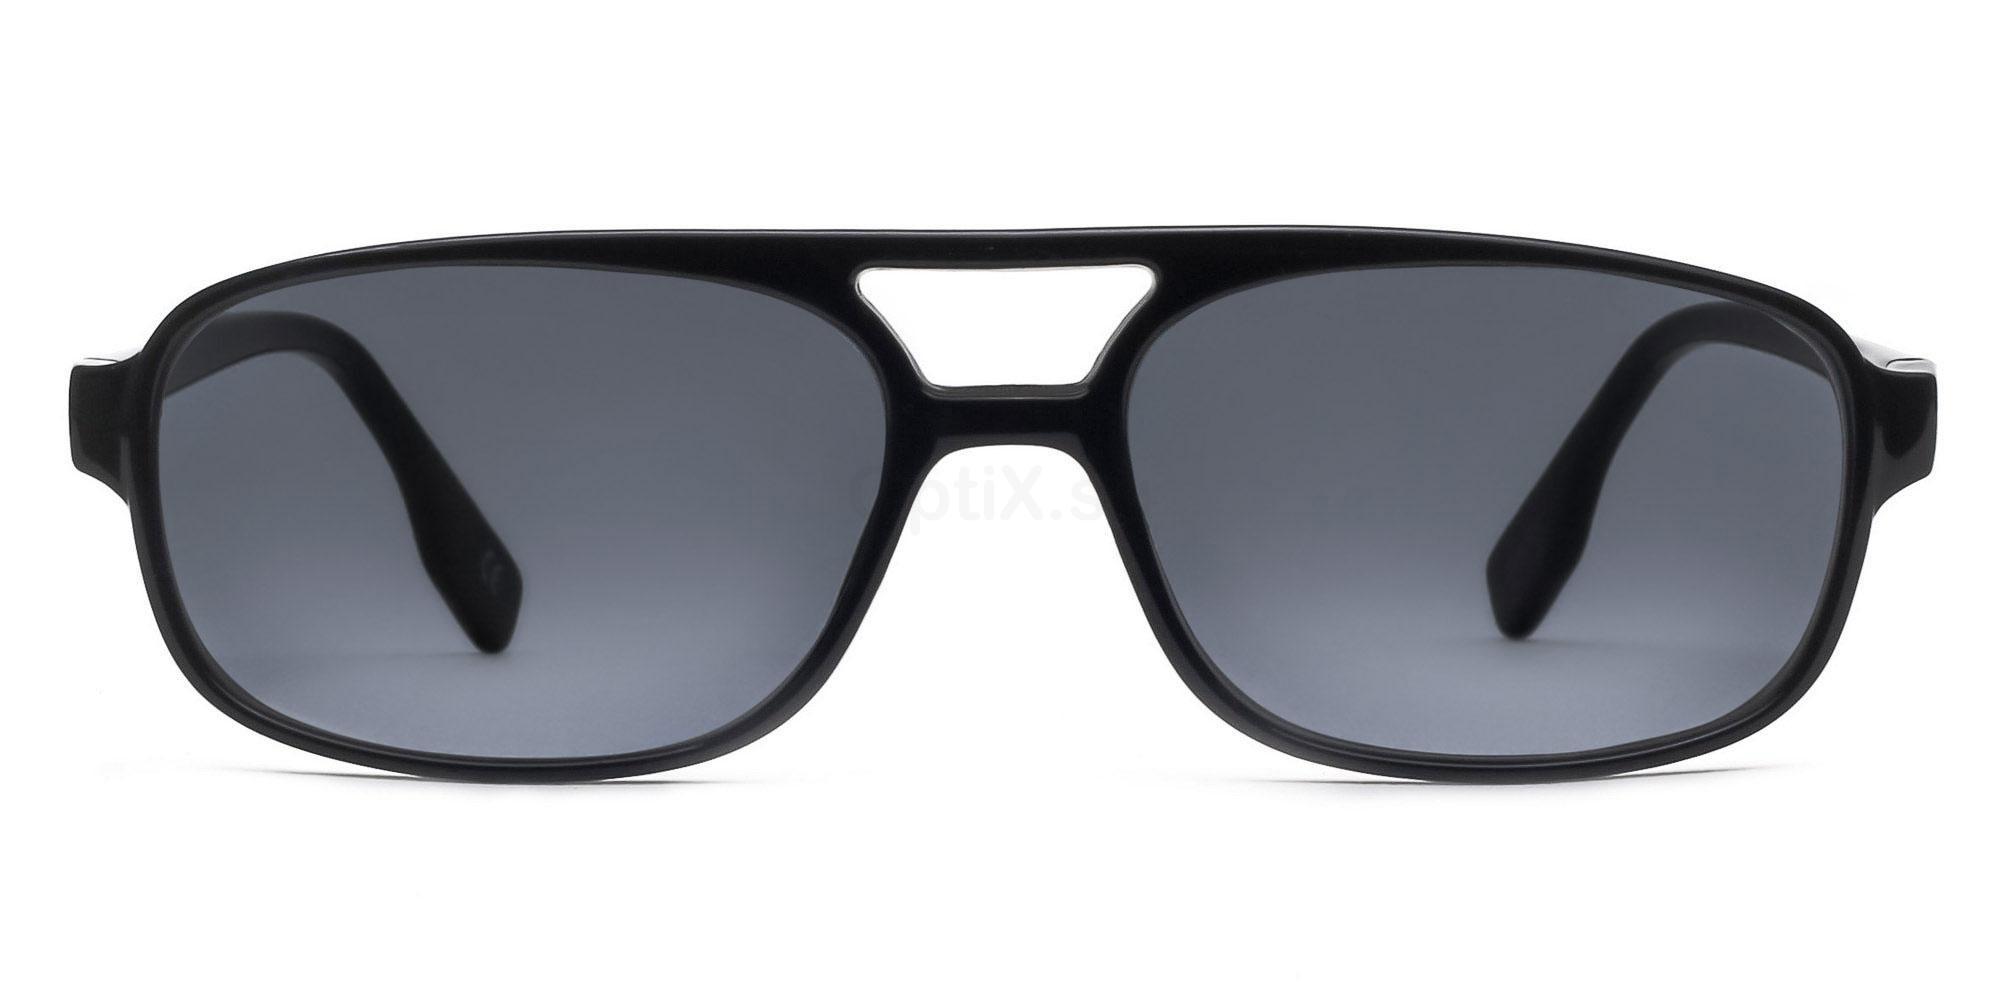 C01 Dark Grey P2395 - Black (Sunglasses) , Savannah